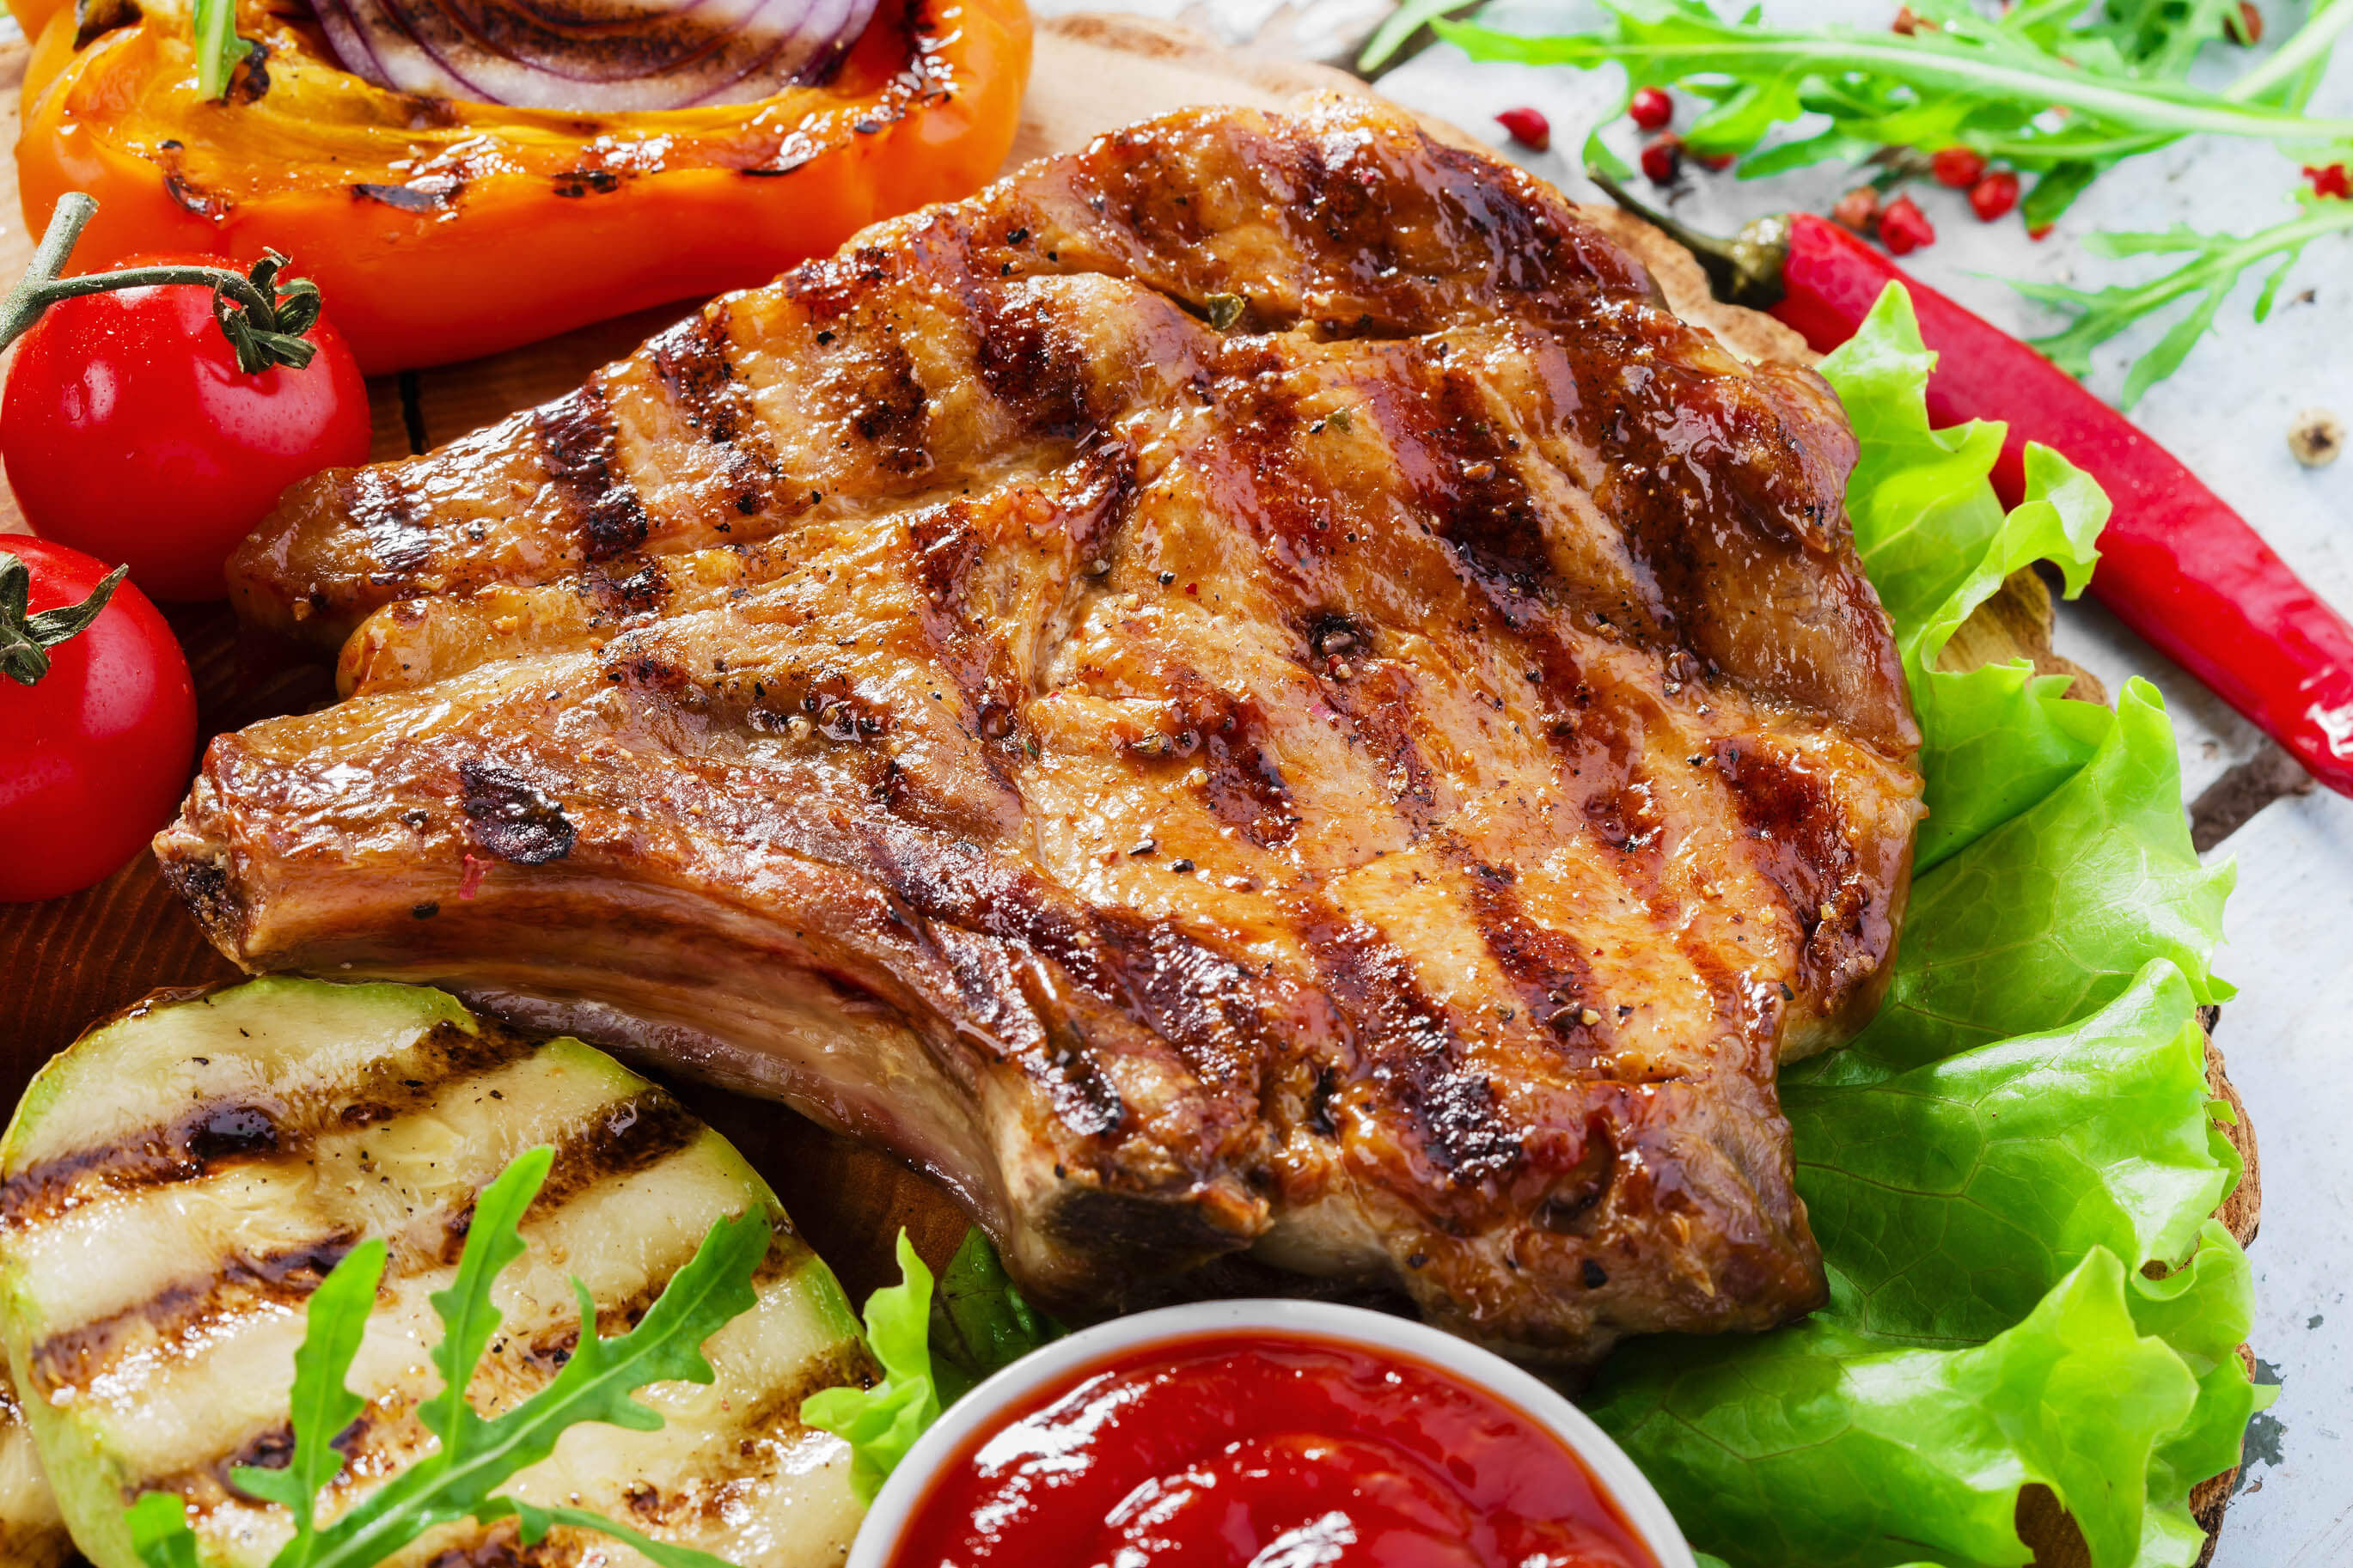 Pork Chops Healthy  Genetic engineering could make pork heart healthy if not